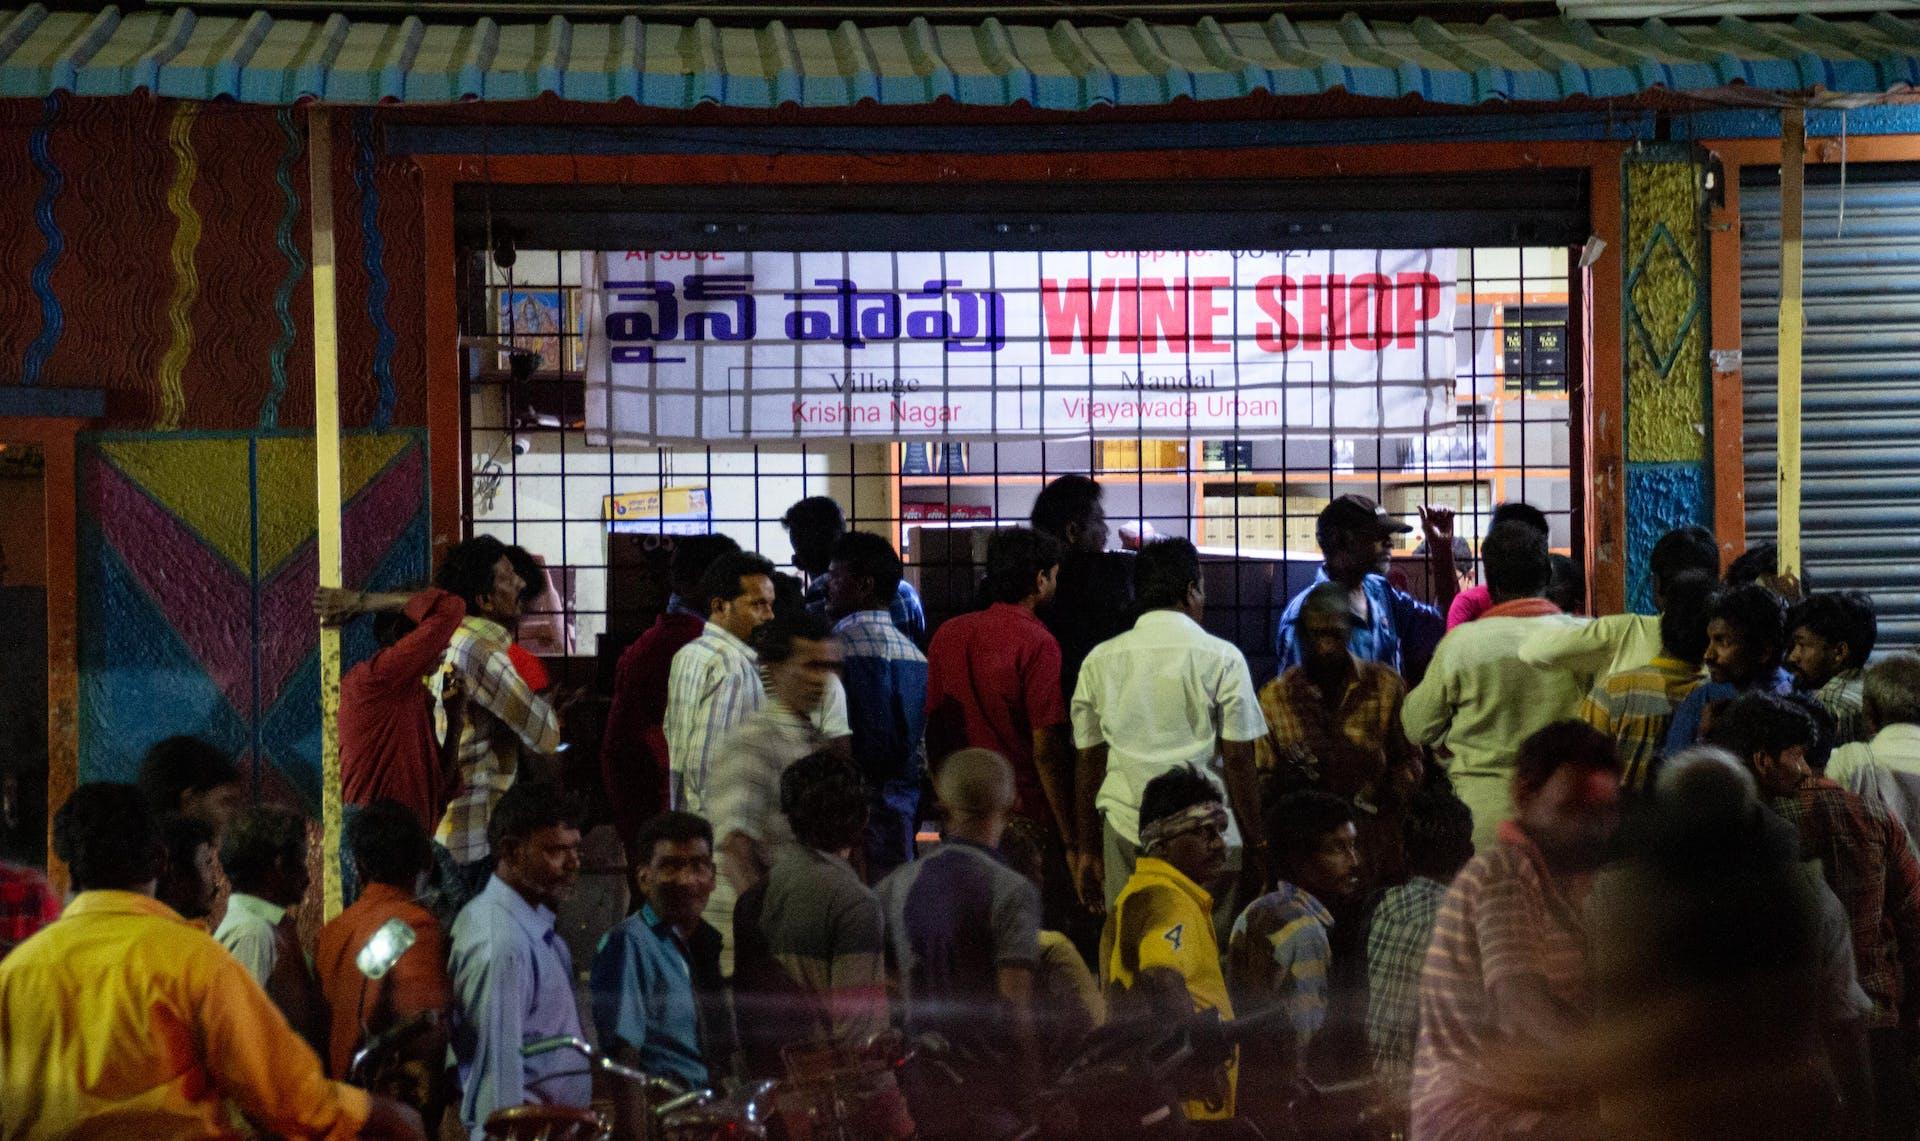 The remaining wine shops in Vijayawada draw jostling crowds every night. Photo by Justin Nisly.